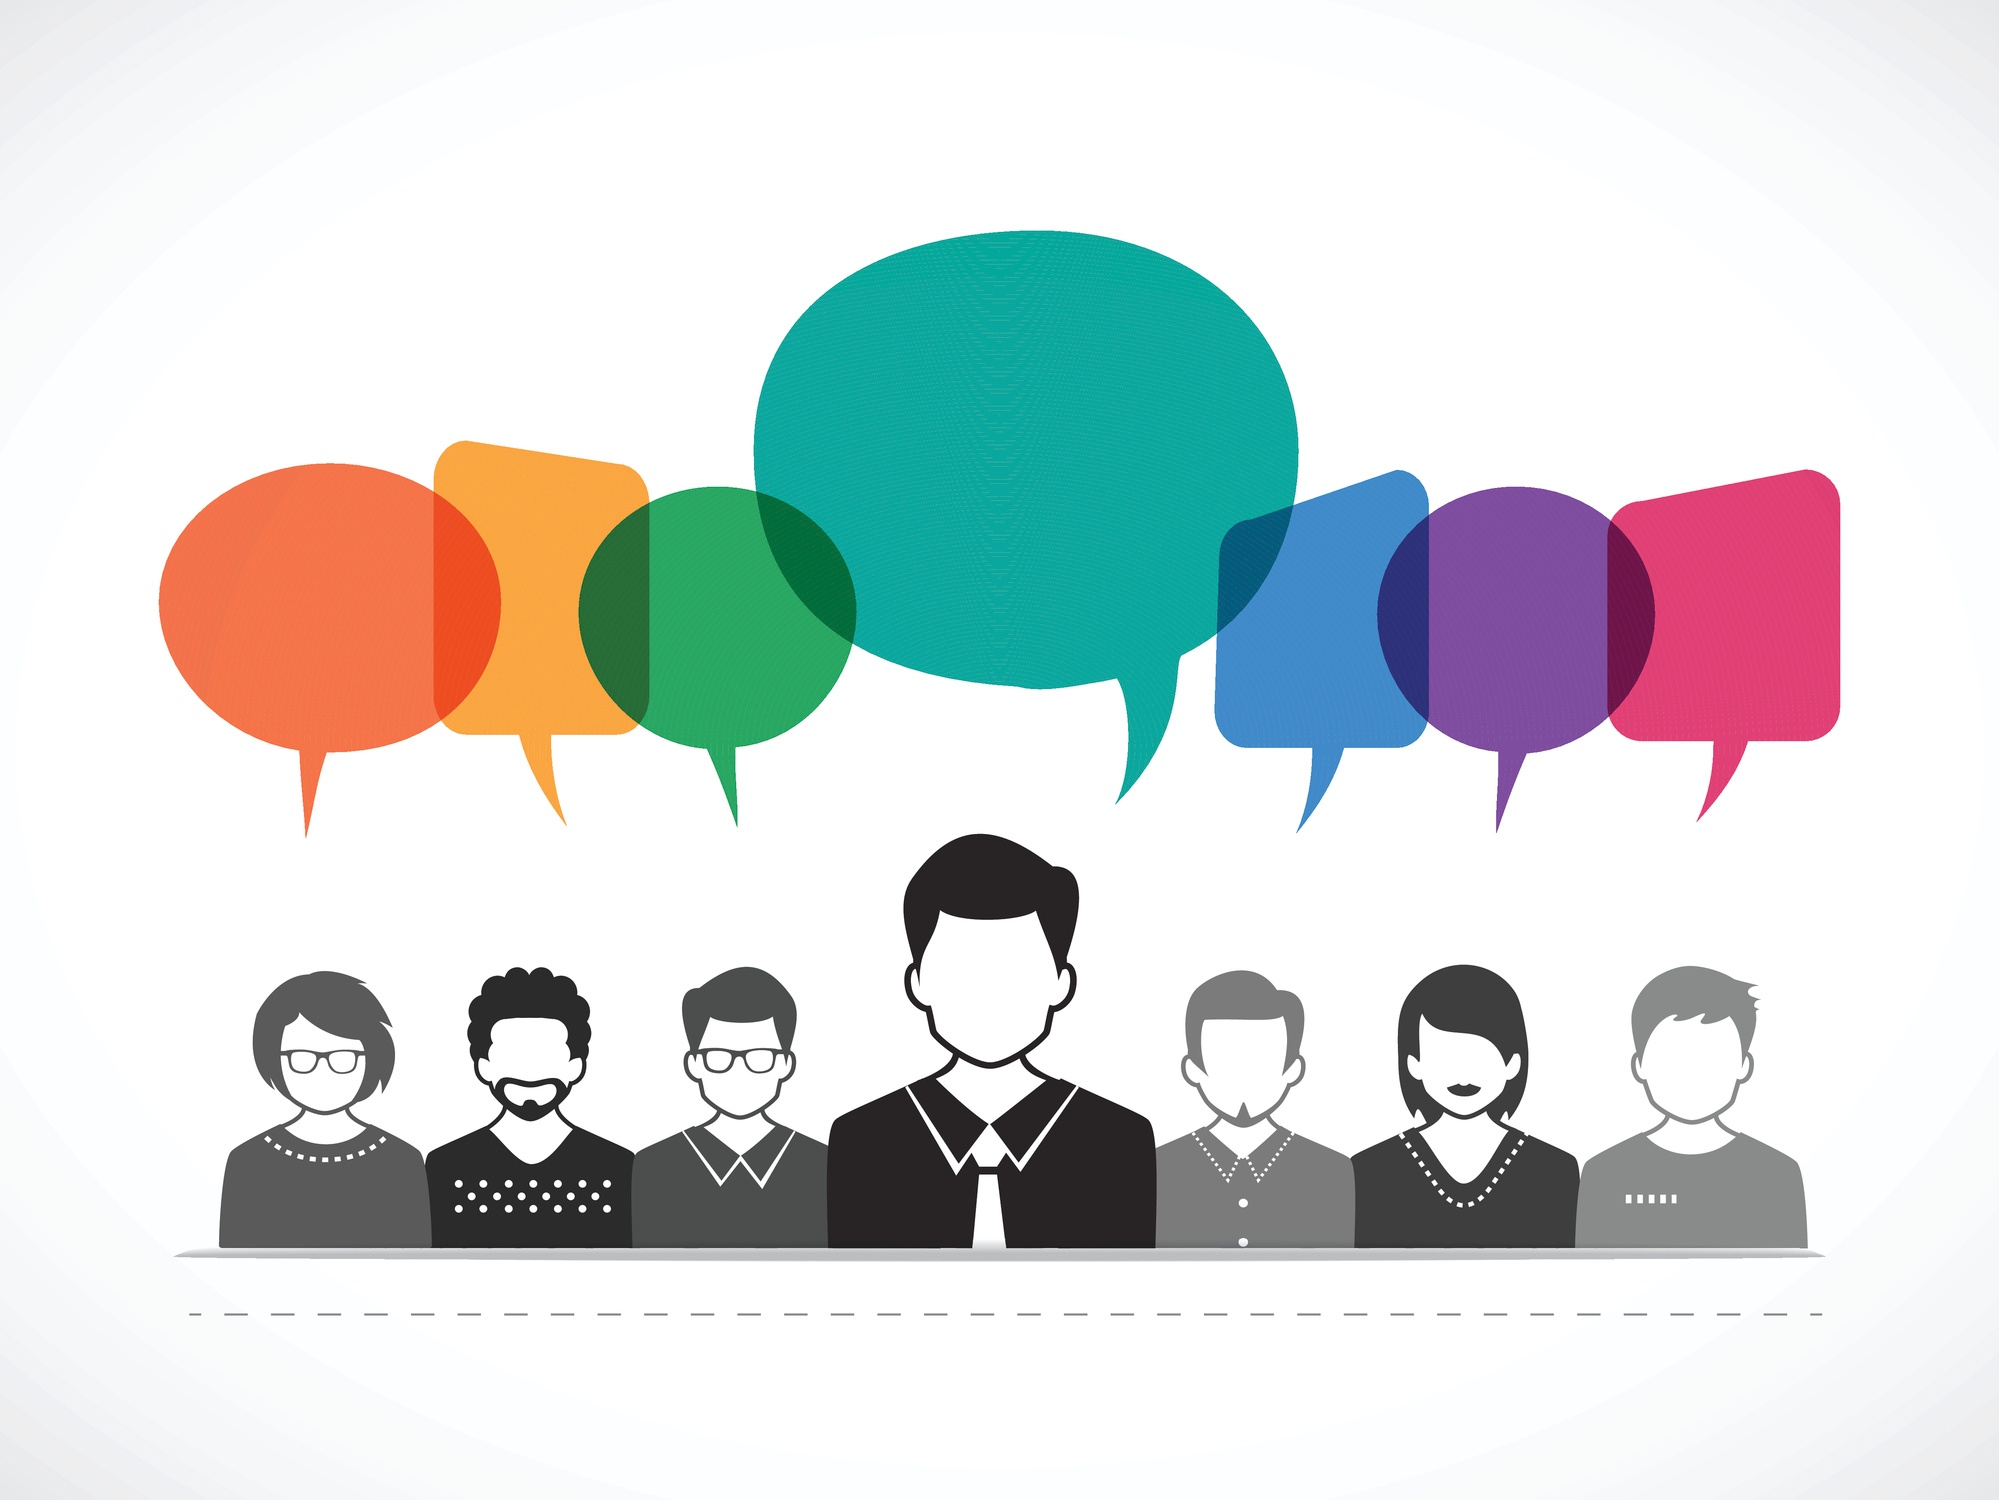 conversational agents